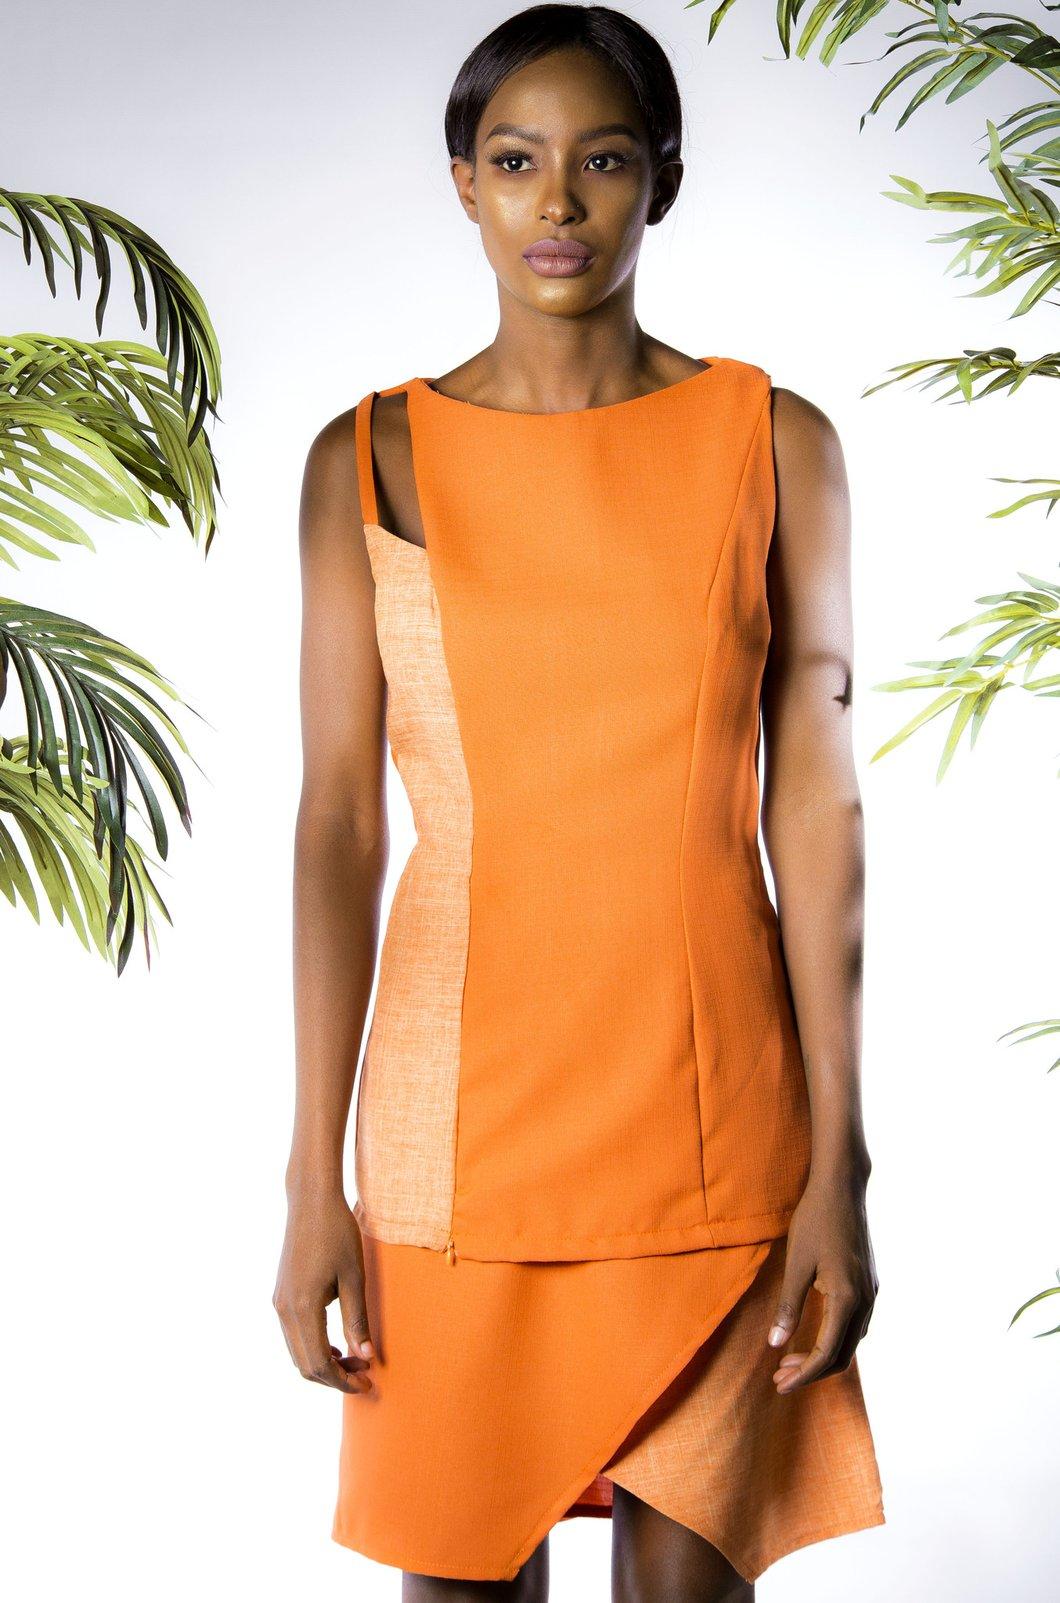 Jideka - The Zara of African Brands